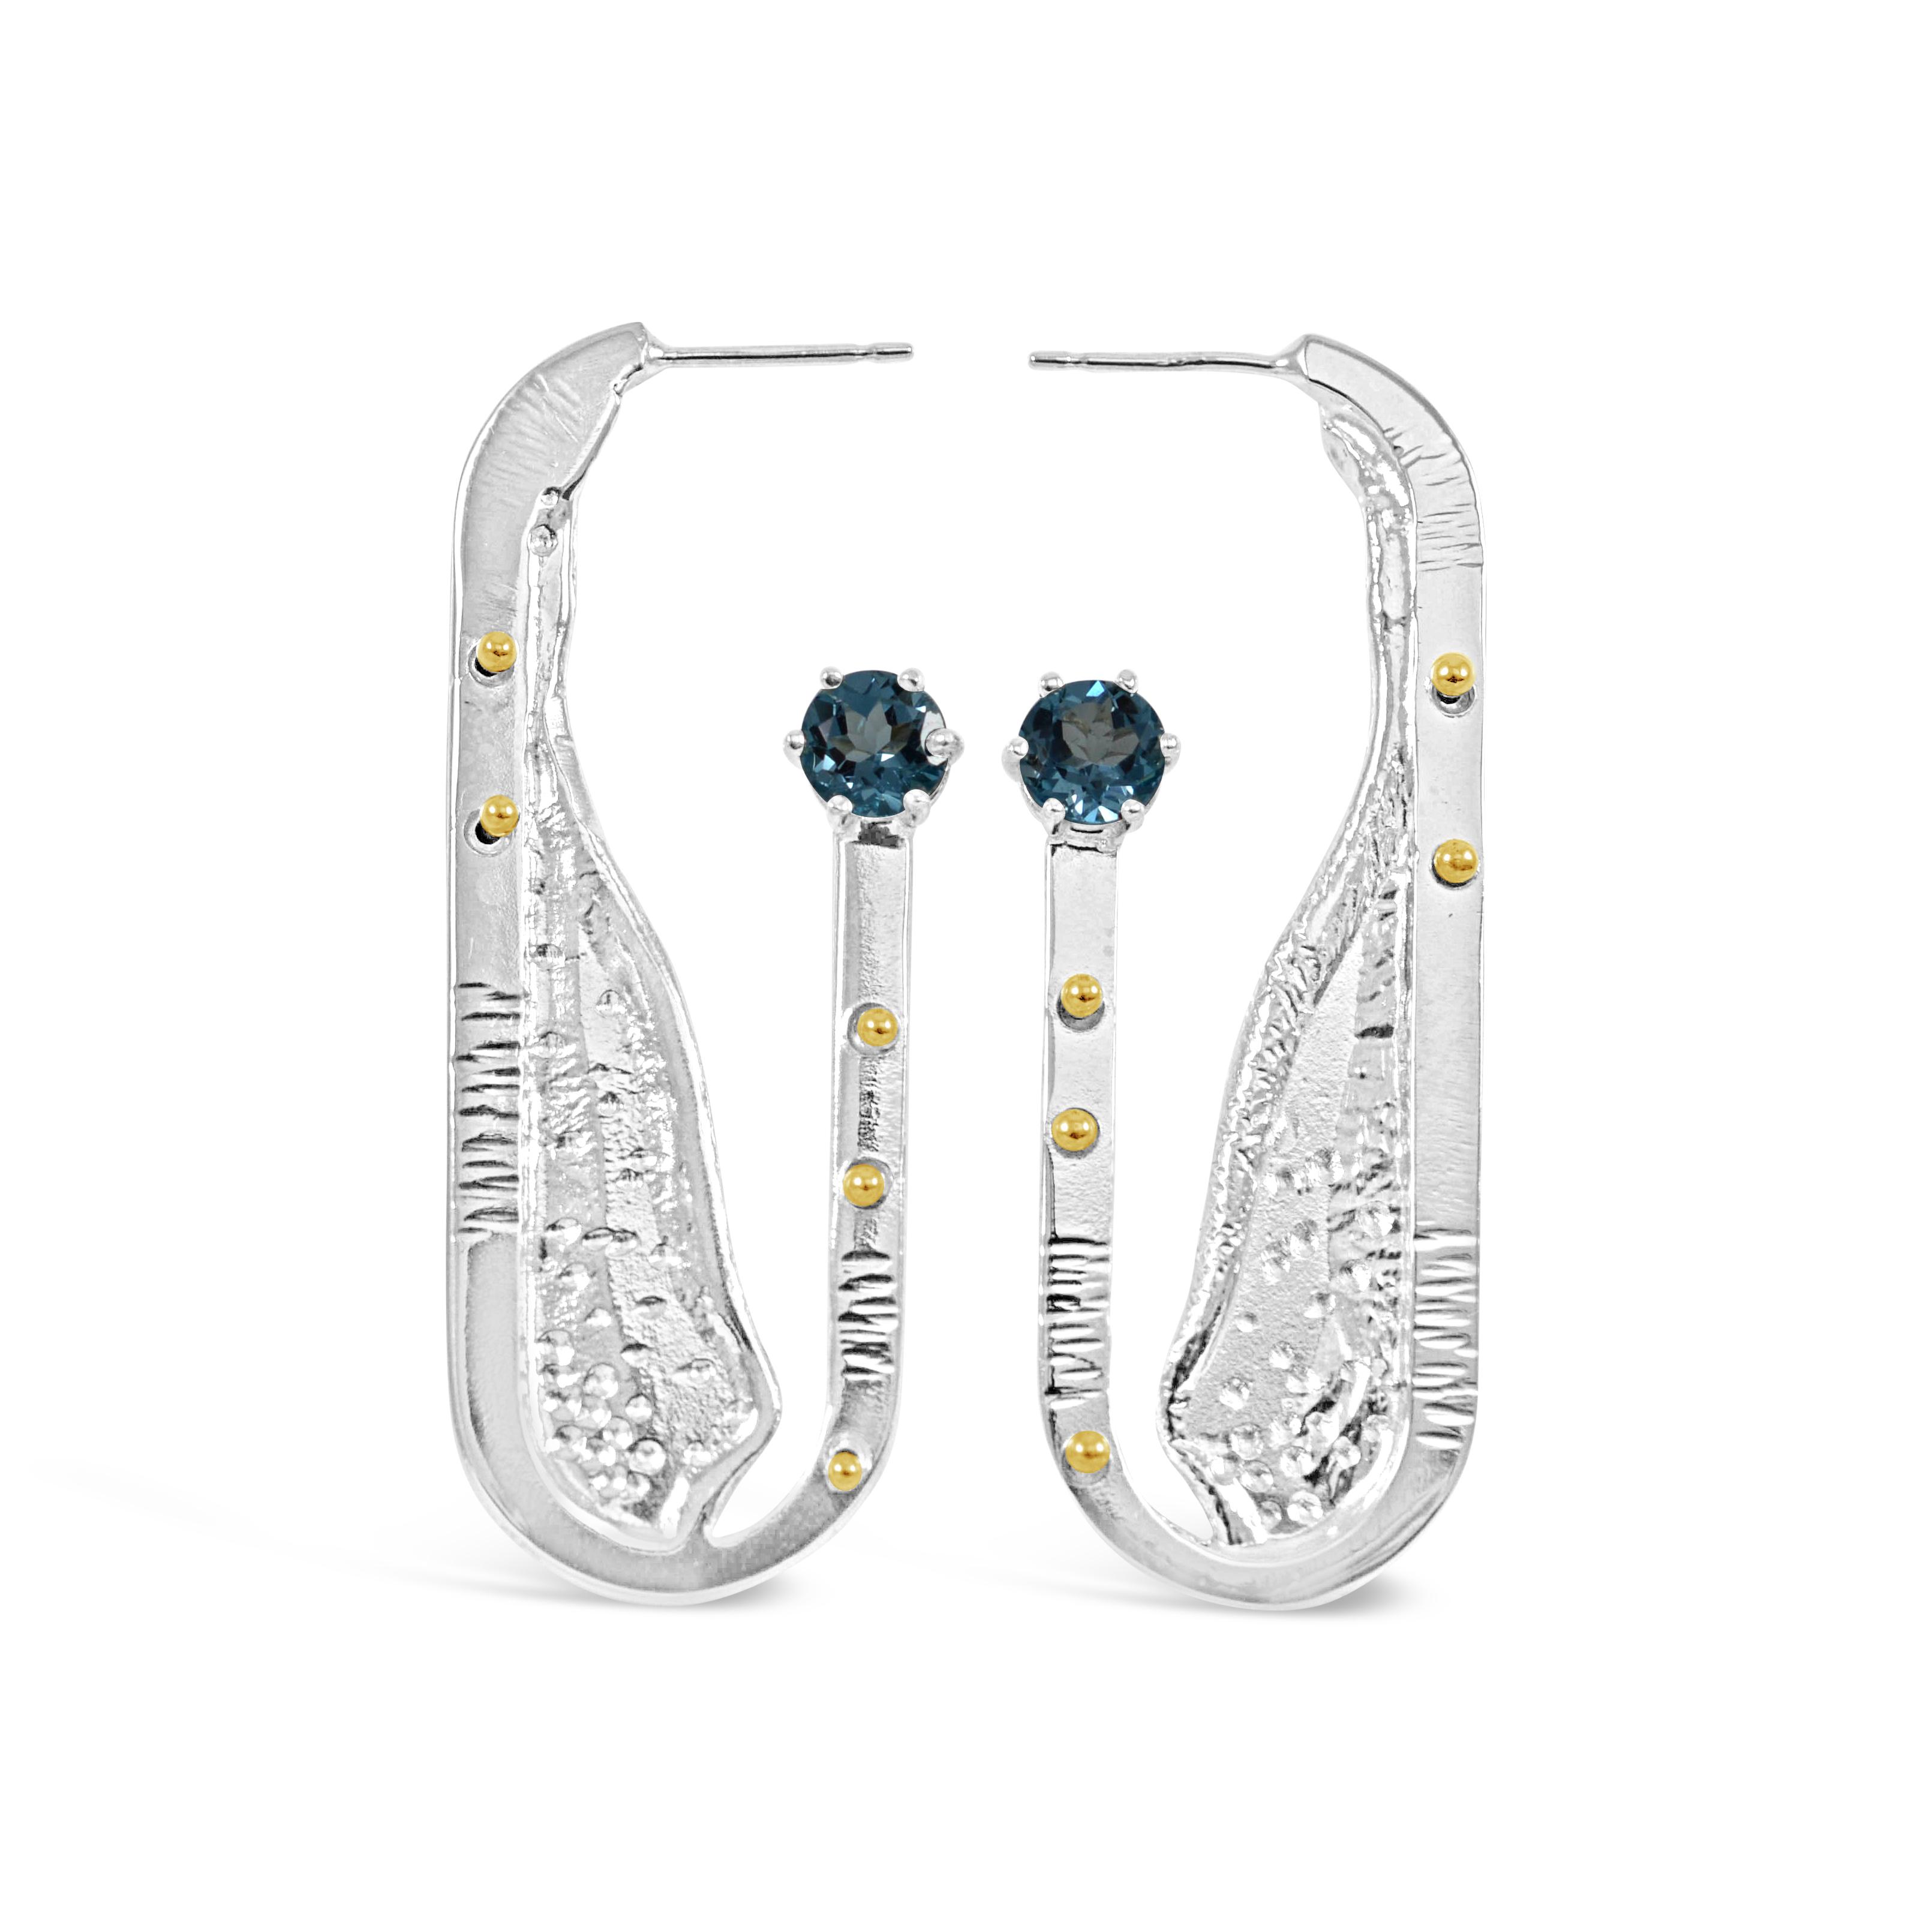 Earrings with blue stones by Kristen Baird